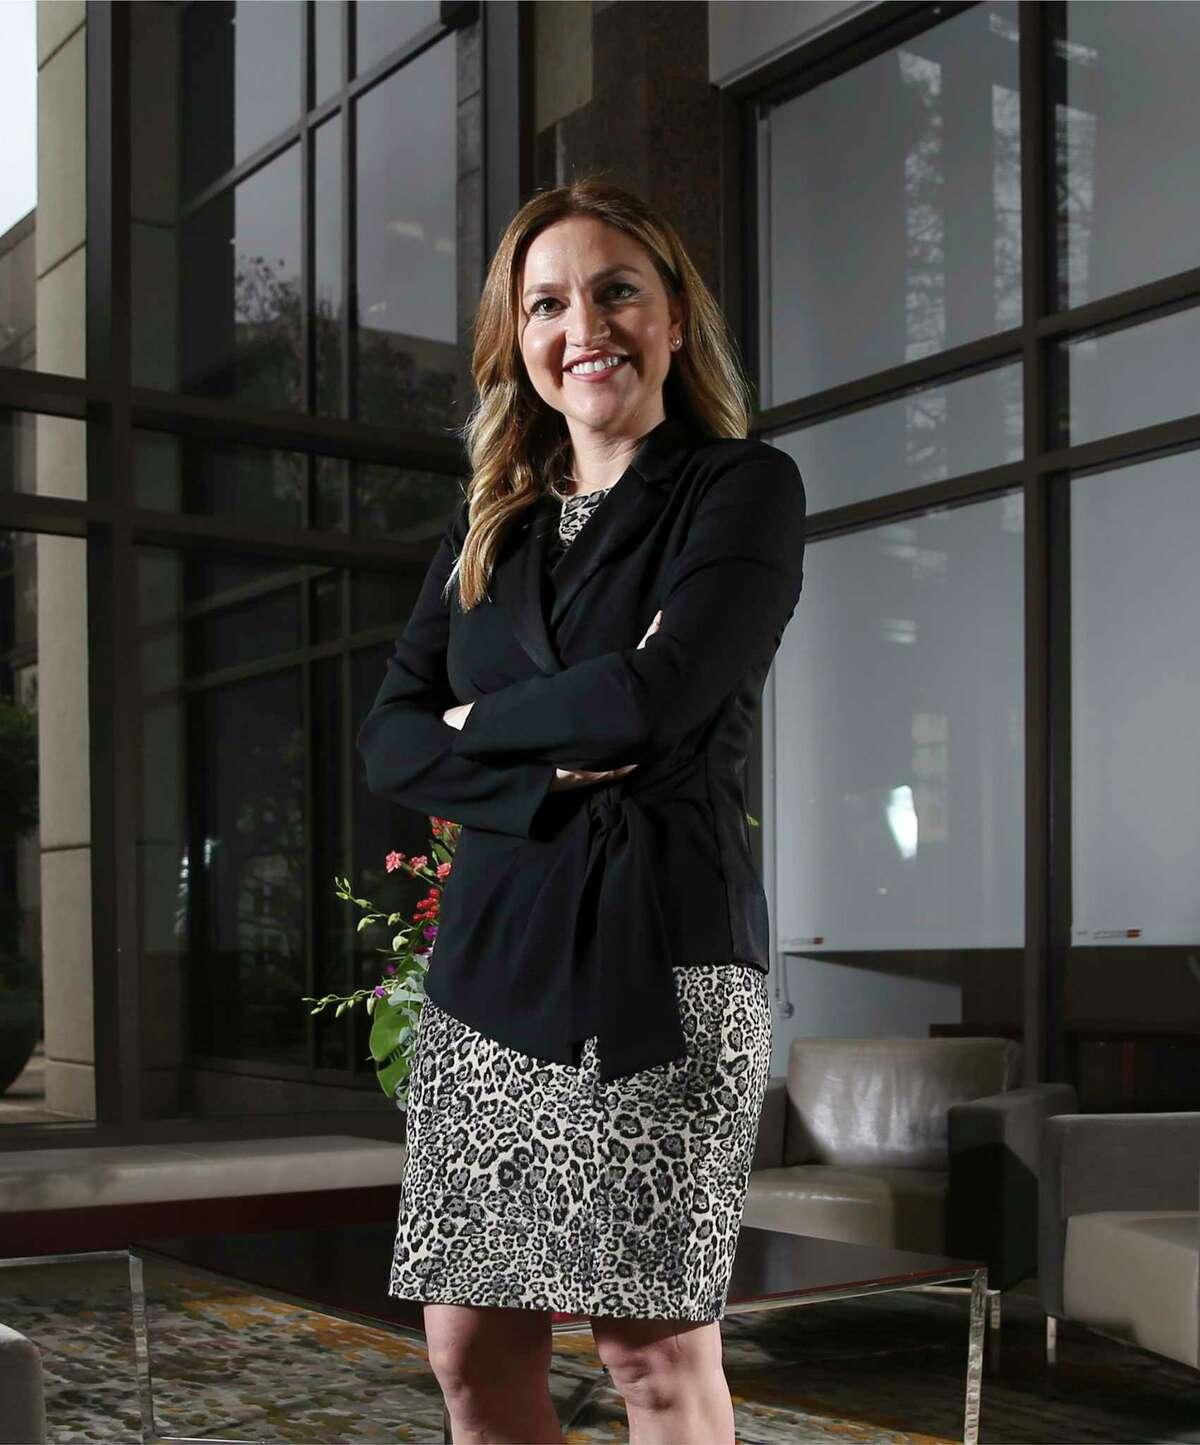 President and CEO, Jenna Saucedo-Herrera ushers in a new era for the economic development organization.